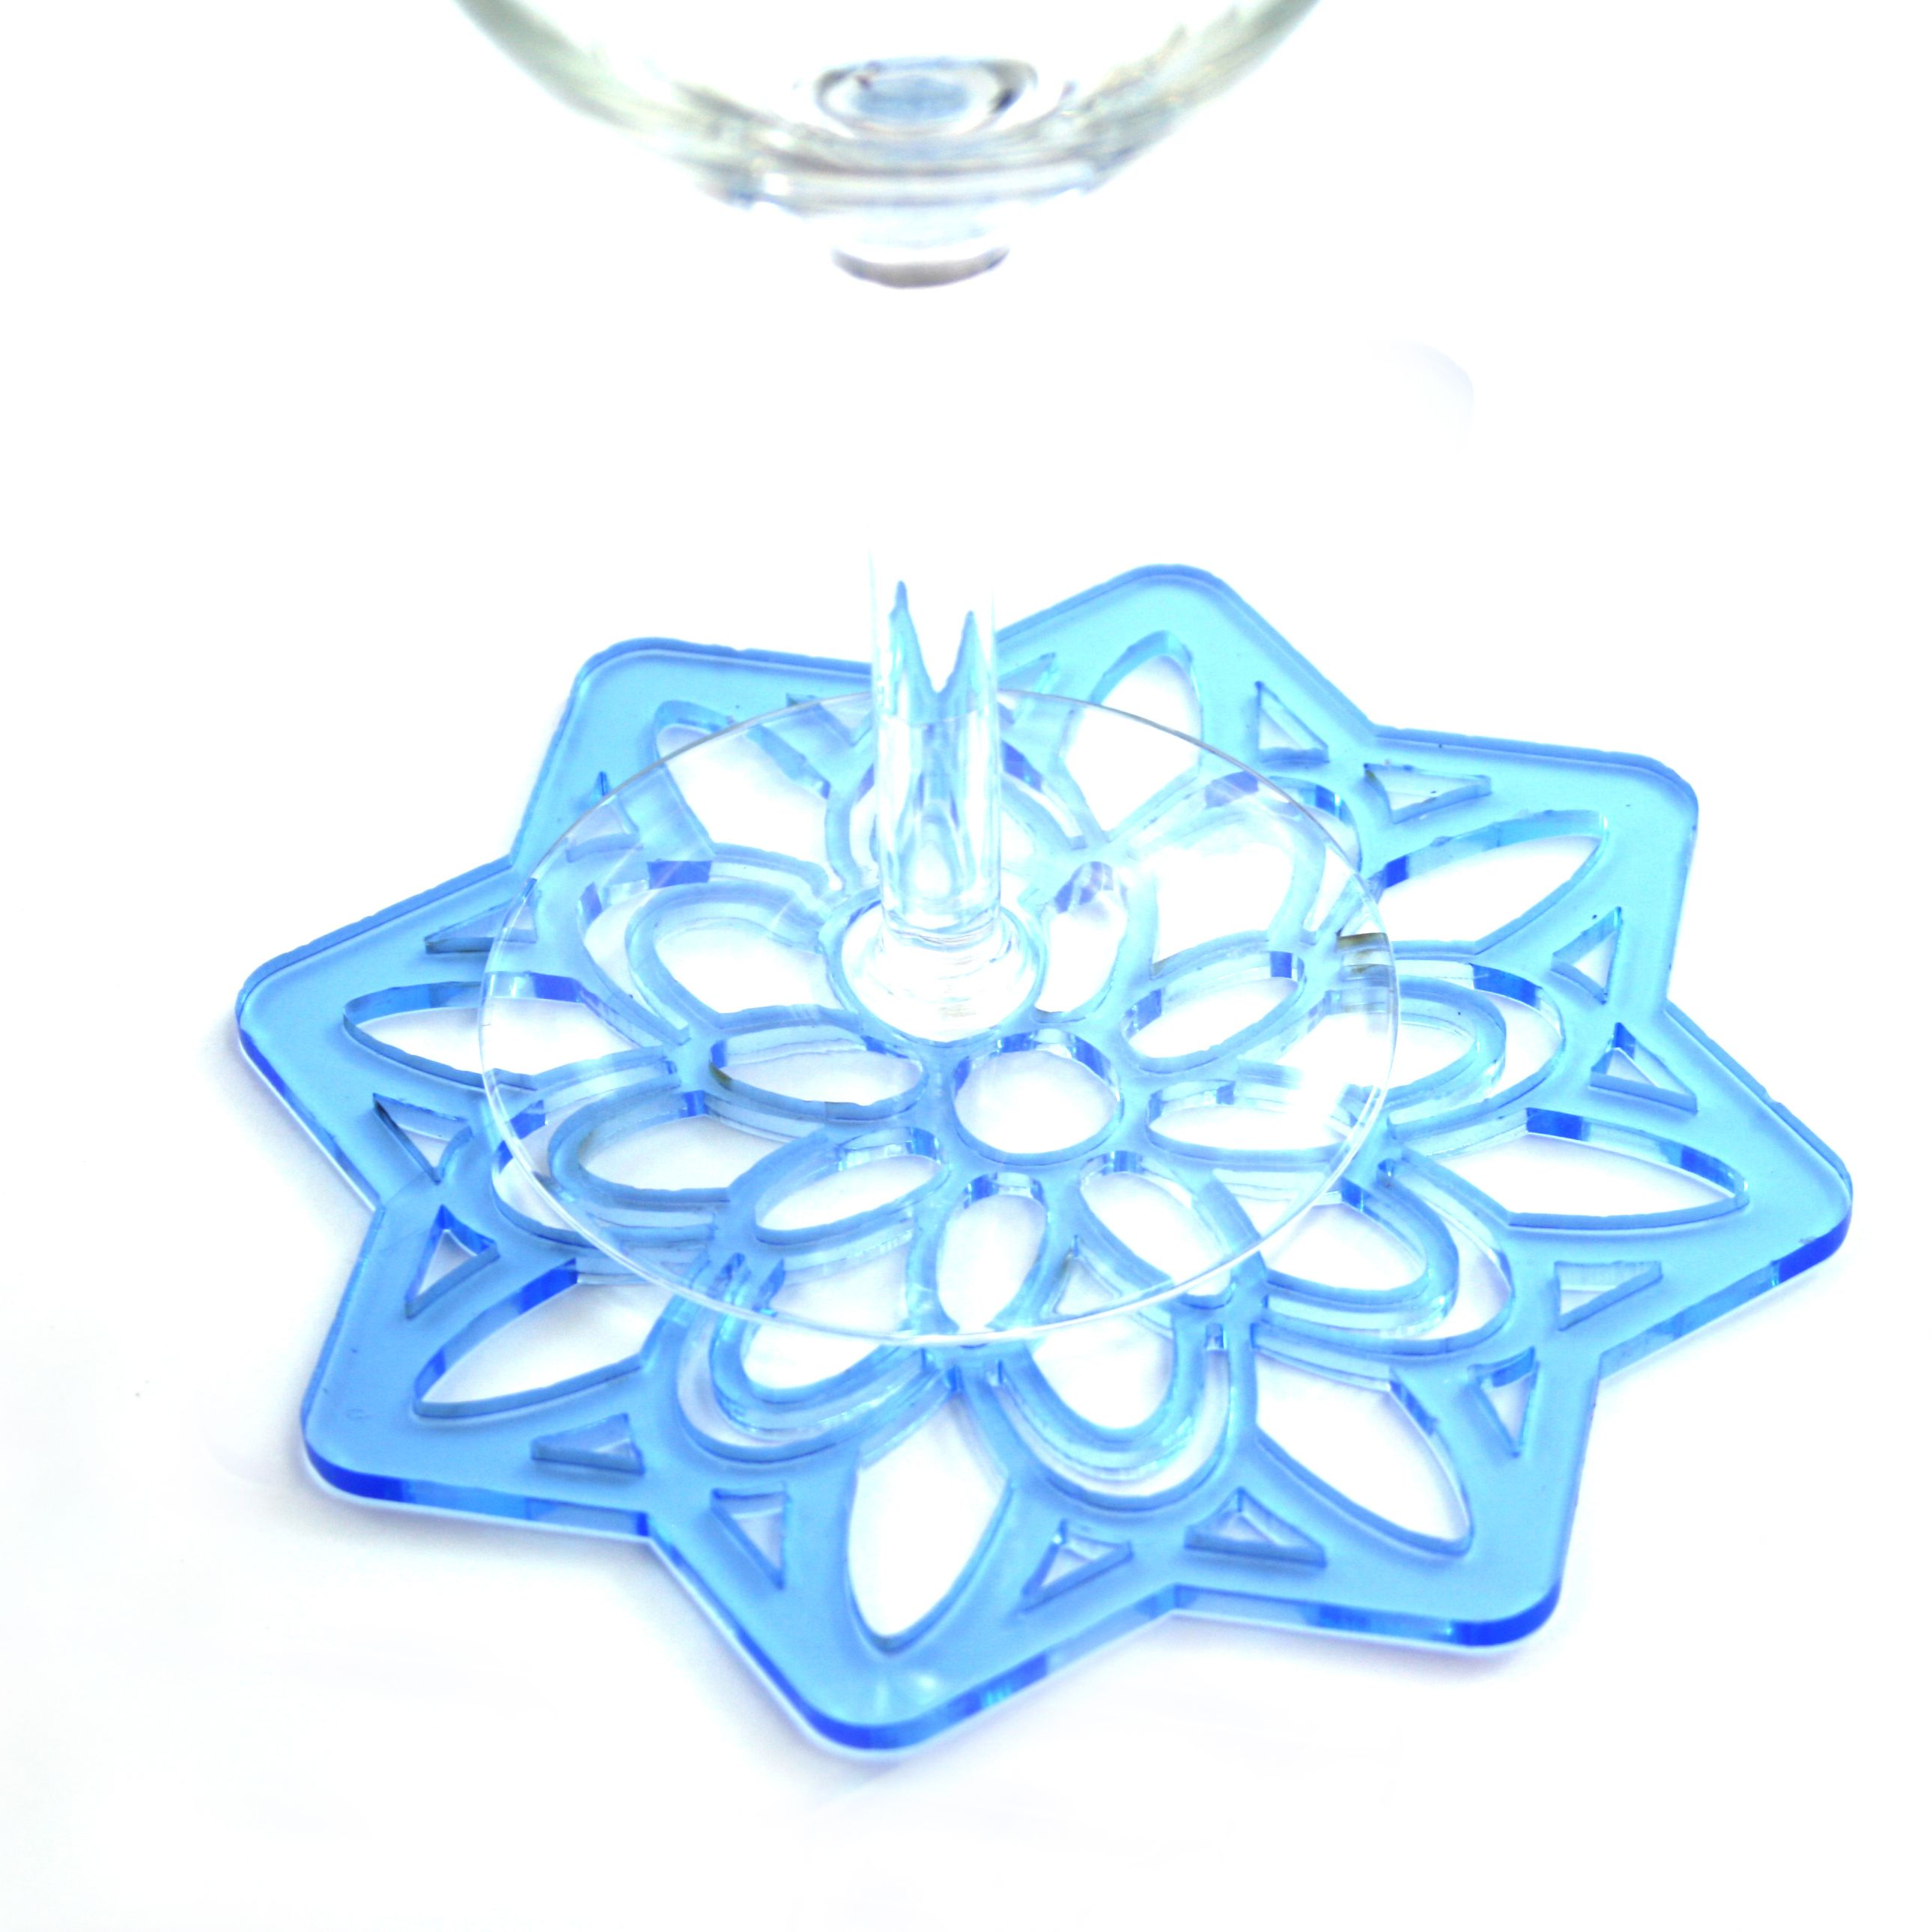 Laser cut acrylic wine bottle coaster or heat mat cut in transparent ...